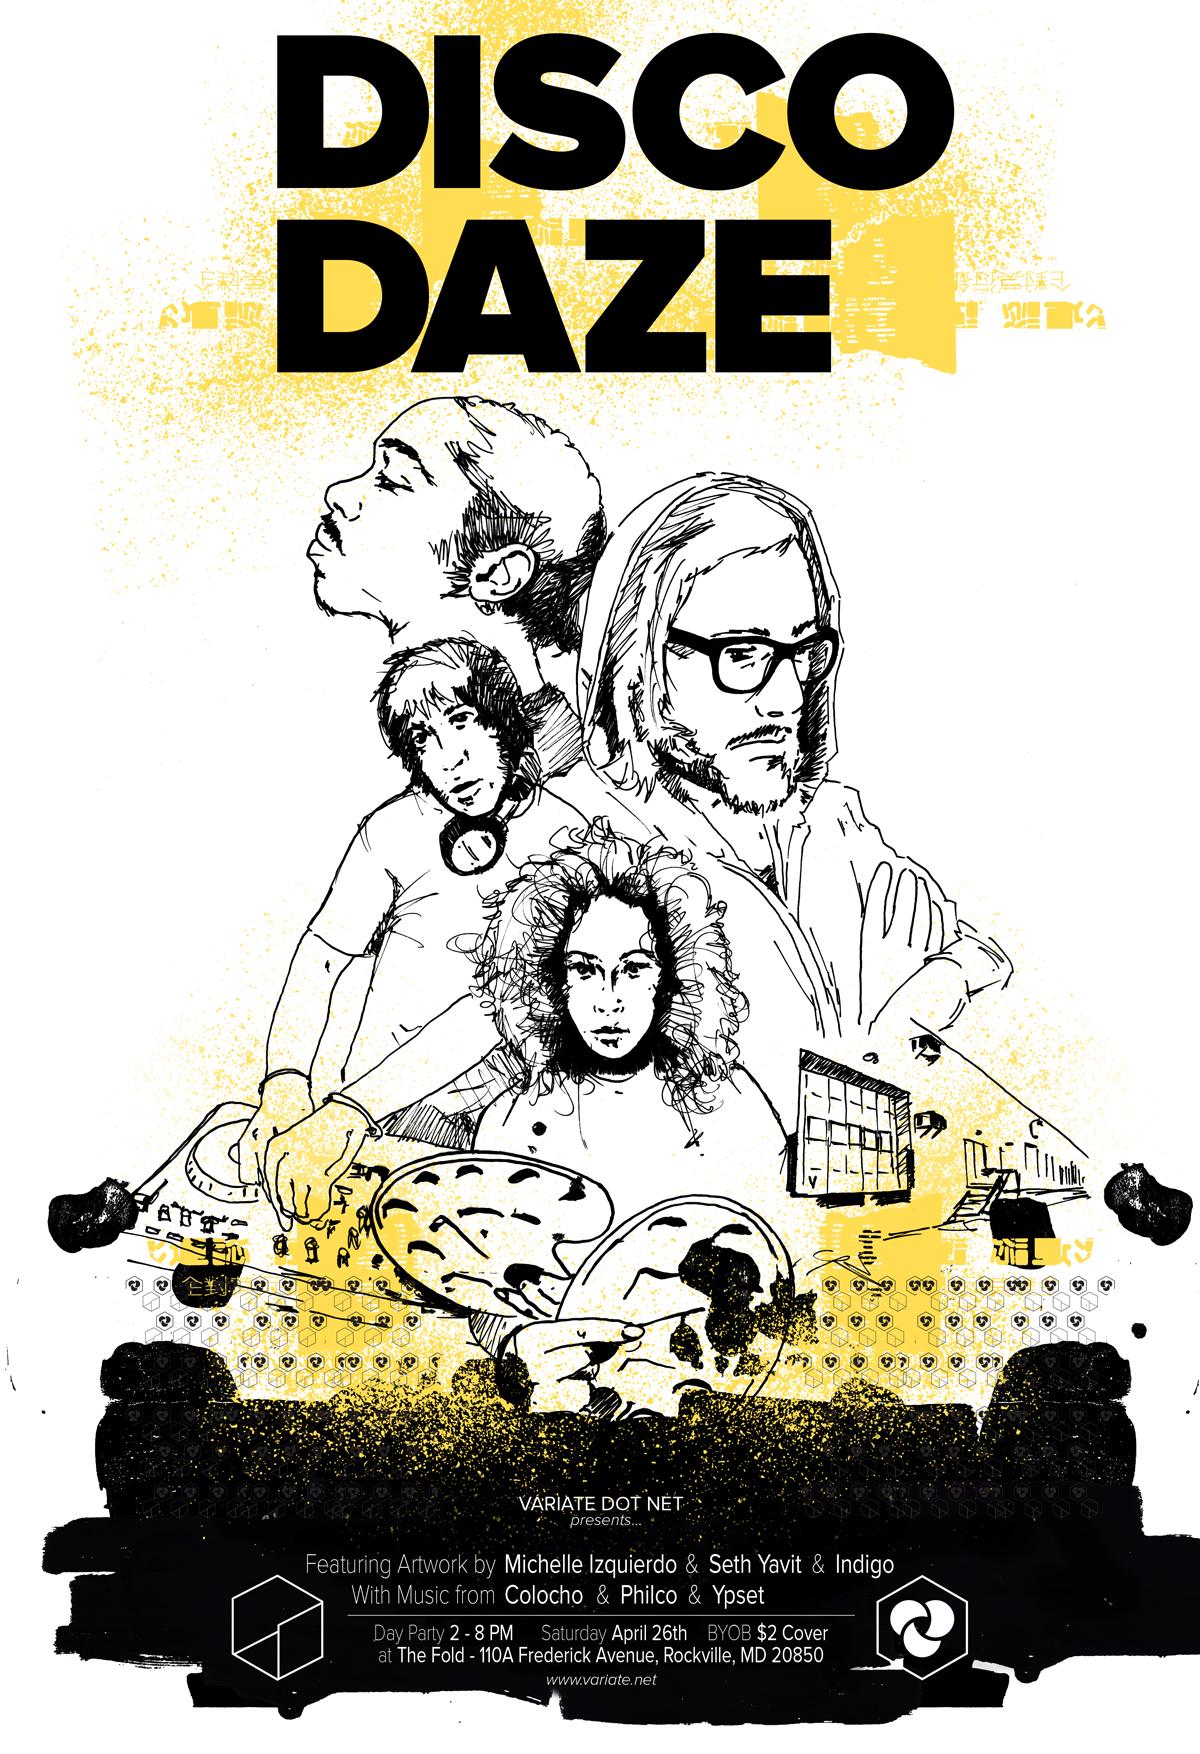 FOLD_2014_disco_daze_poster__72.jpg